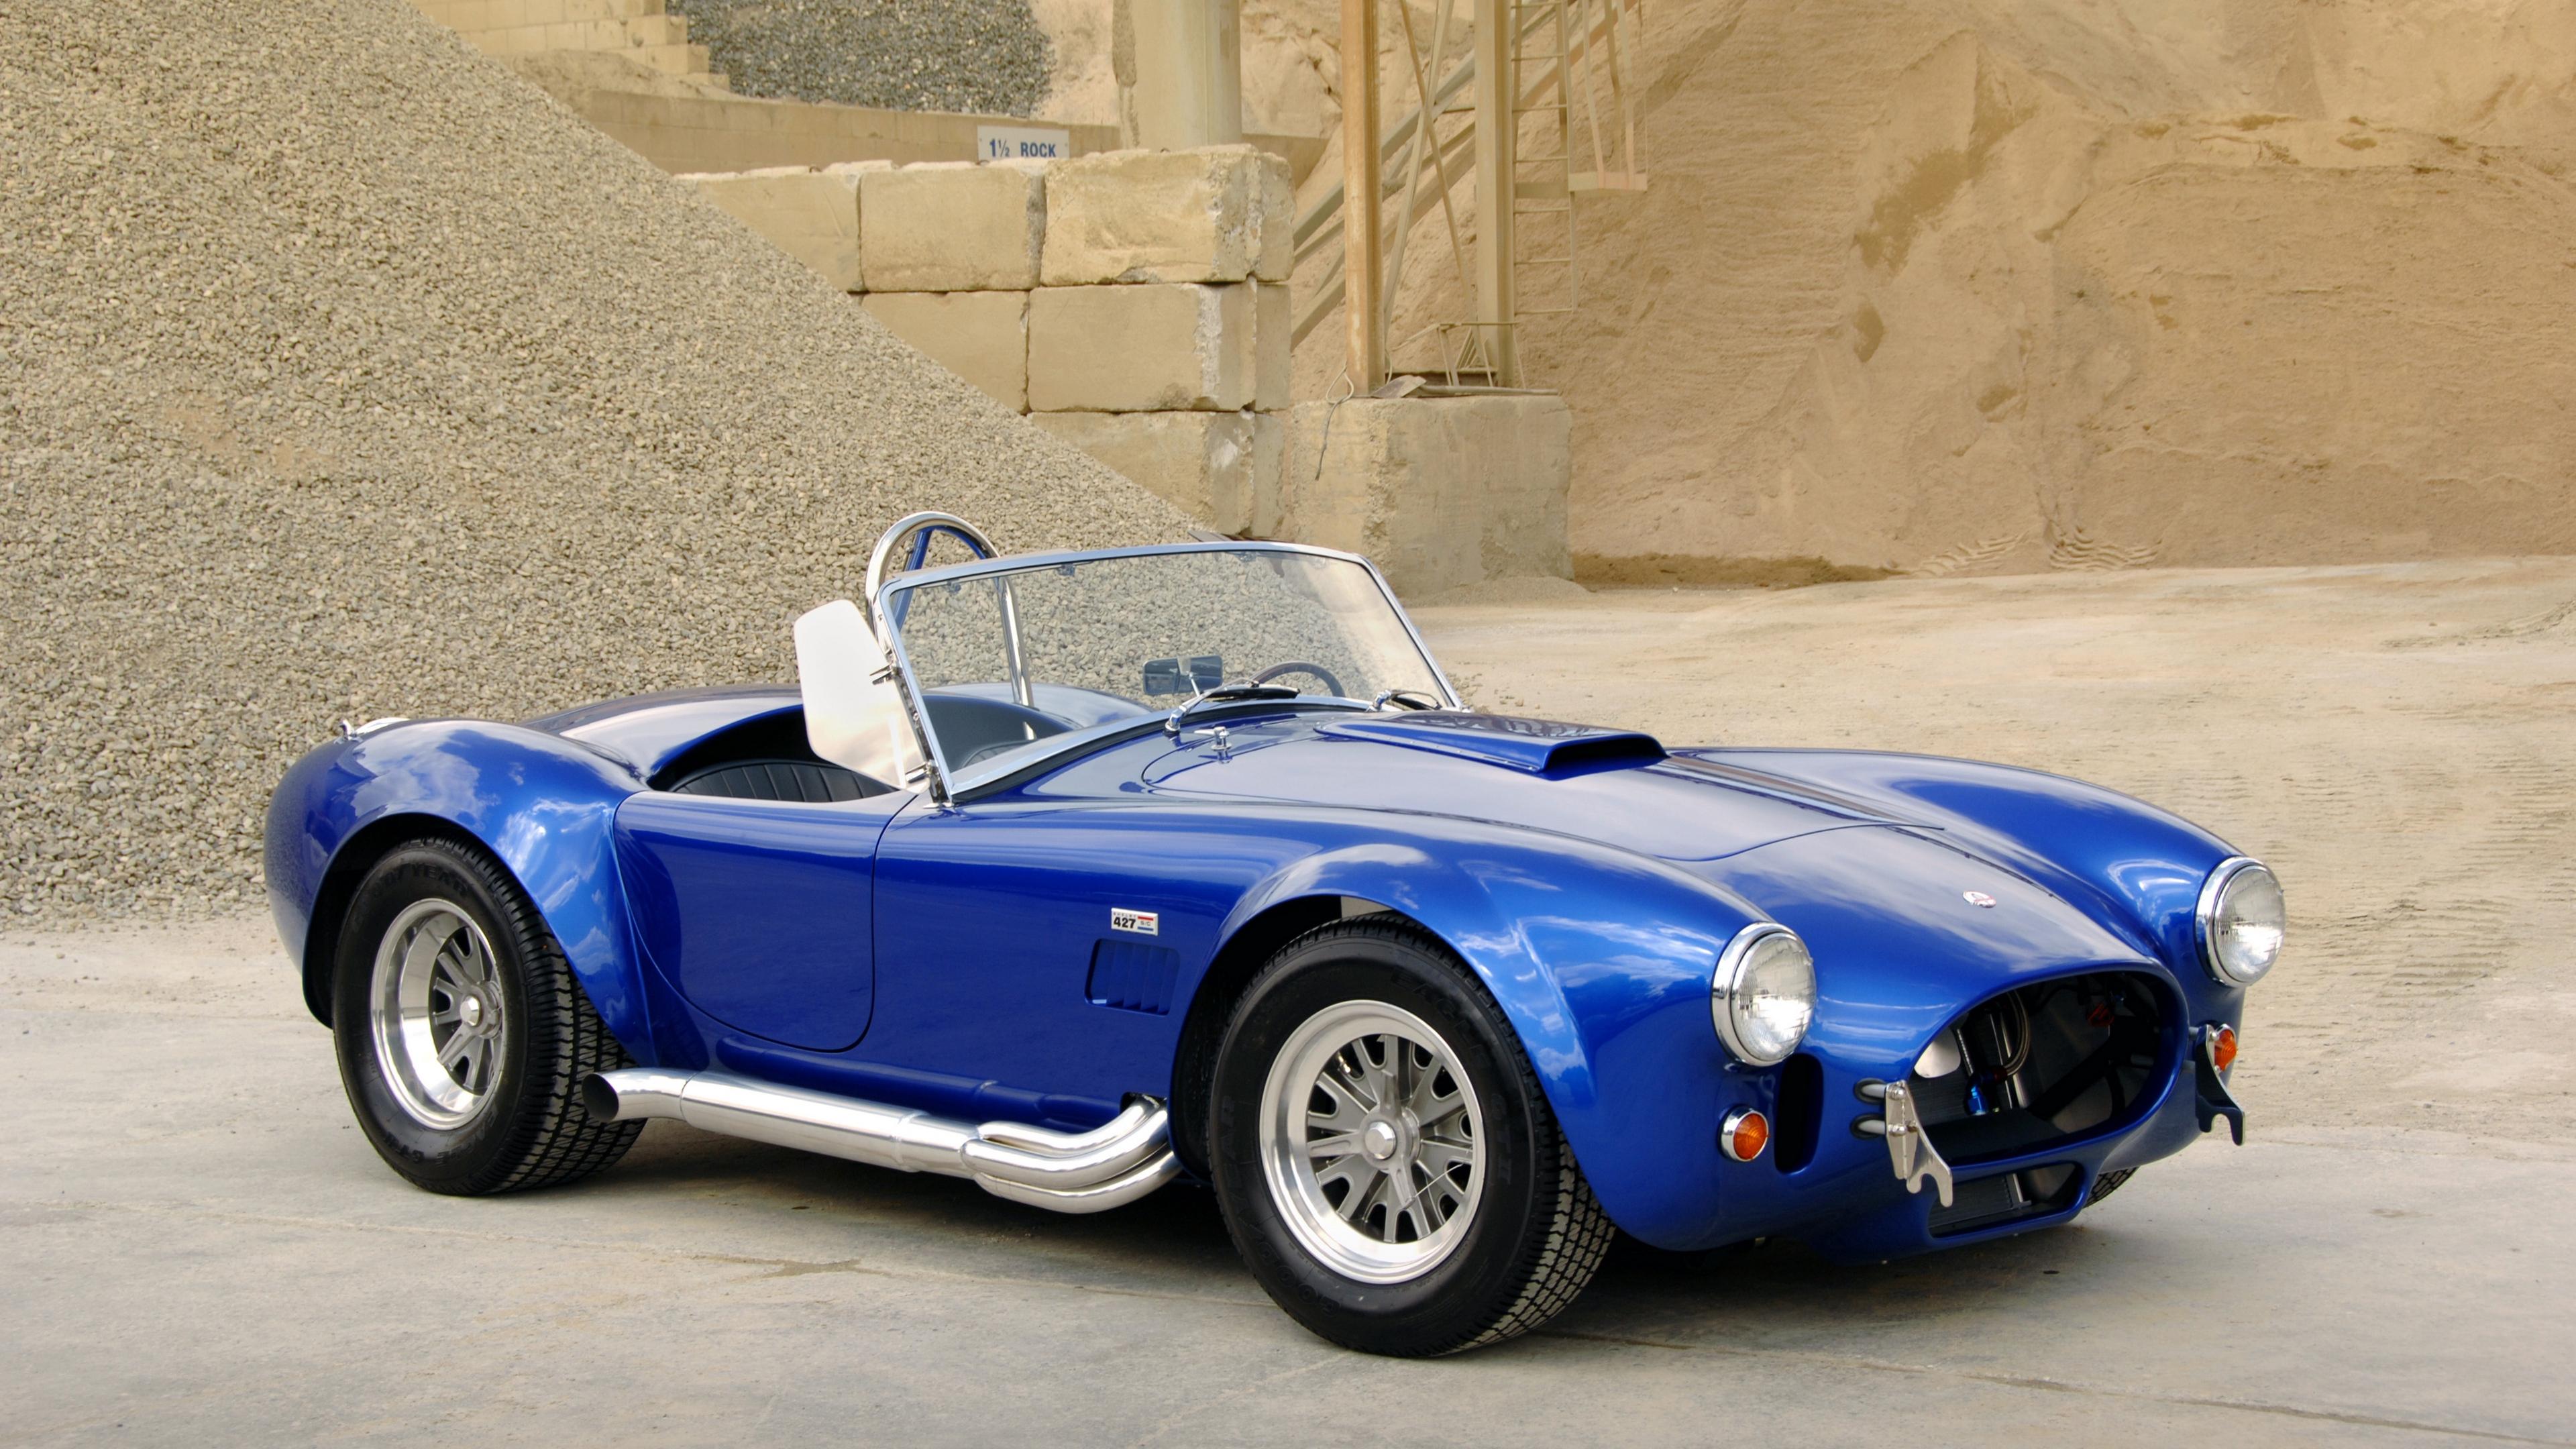 ford shelby cobra 427 1963 csx 4000 4k 1538935302 - ford, shelby, cobra, 427, 1963, csx 4000 4k - Shelby, Ford, cobra